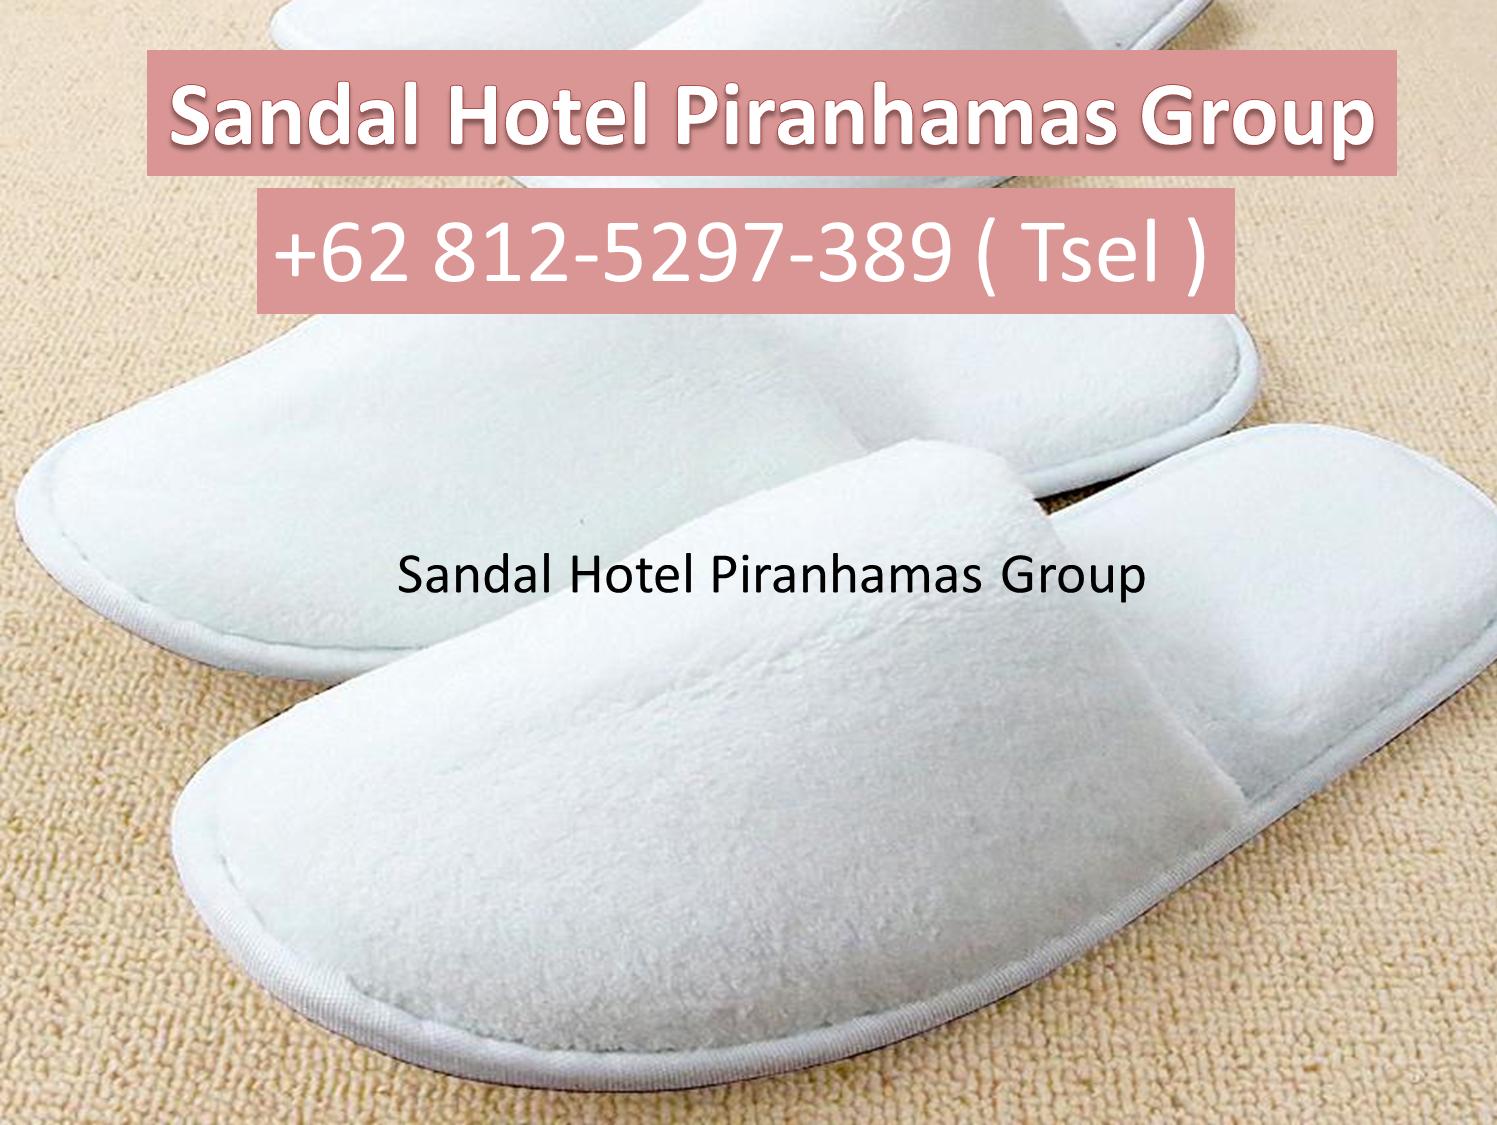 370a40bfa79e Jual Sandal Hotel Murah Piranhamas Group